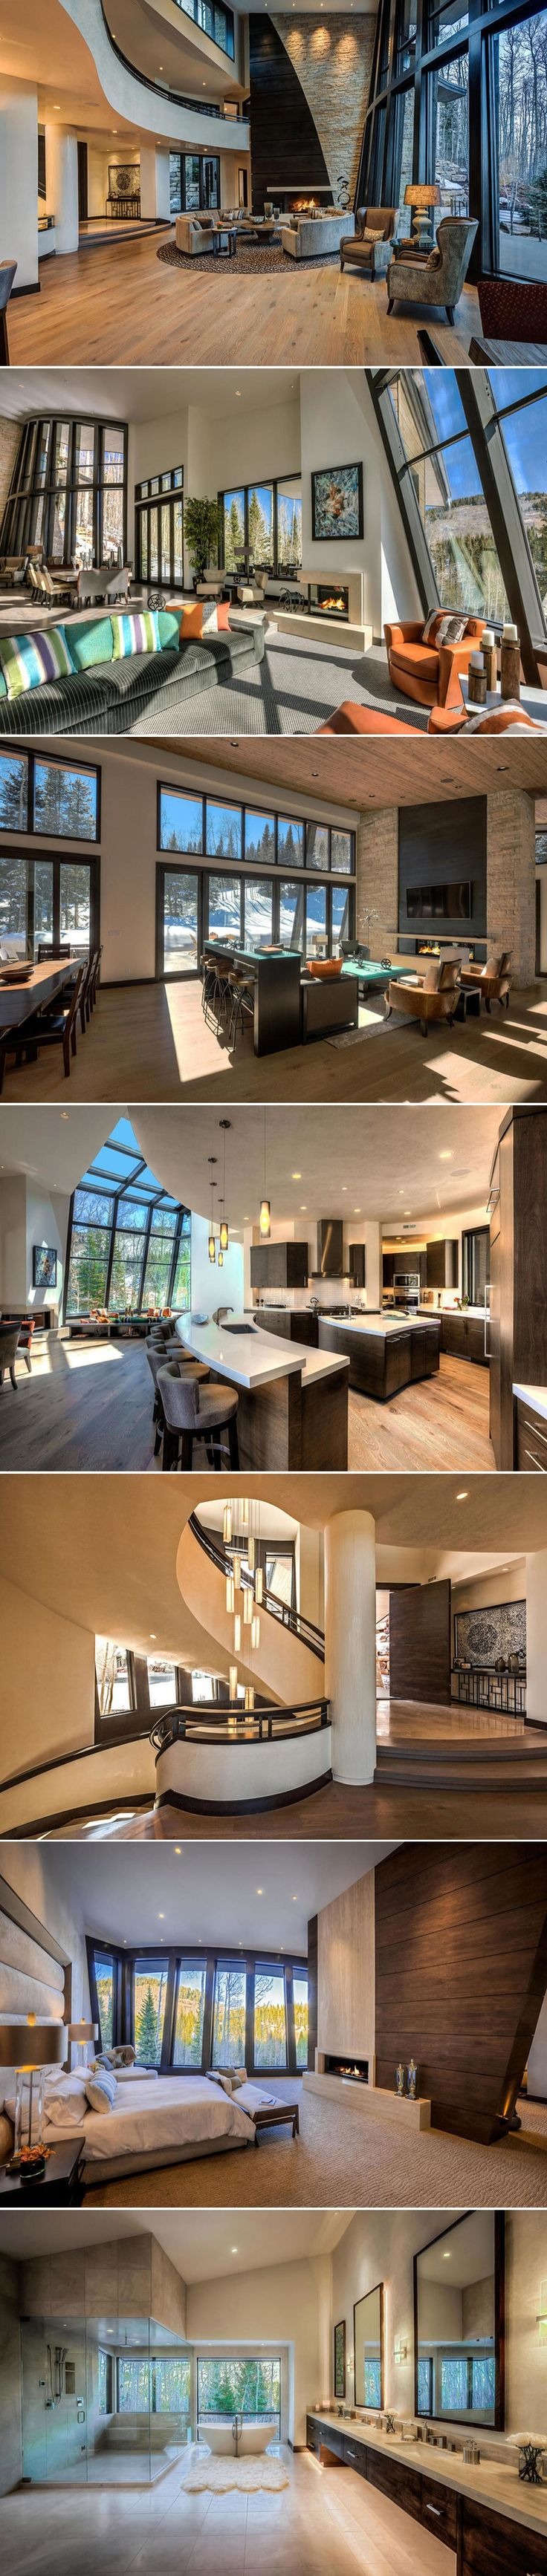 best architectinteriorsexteriors images on pinterest bay